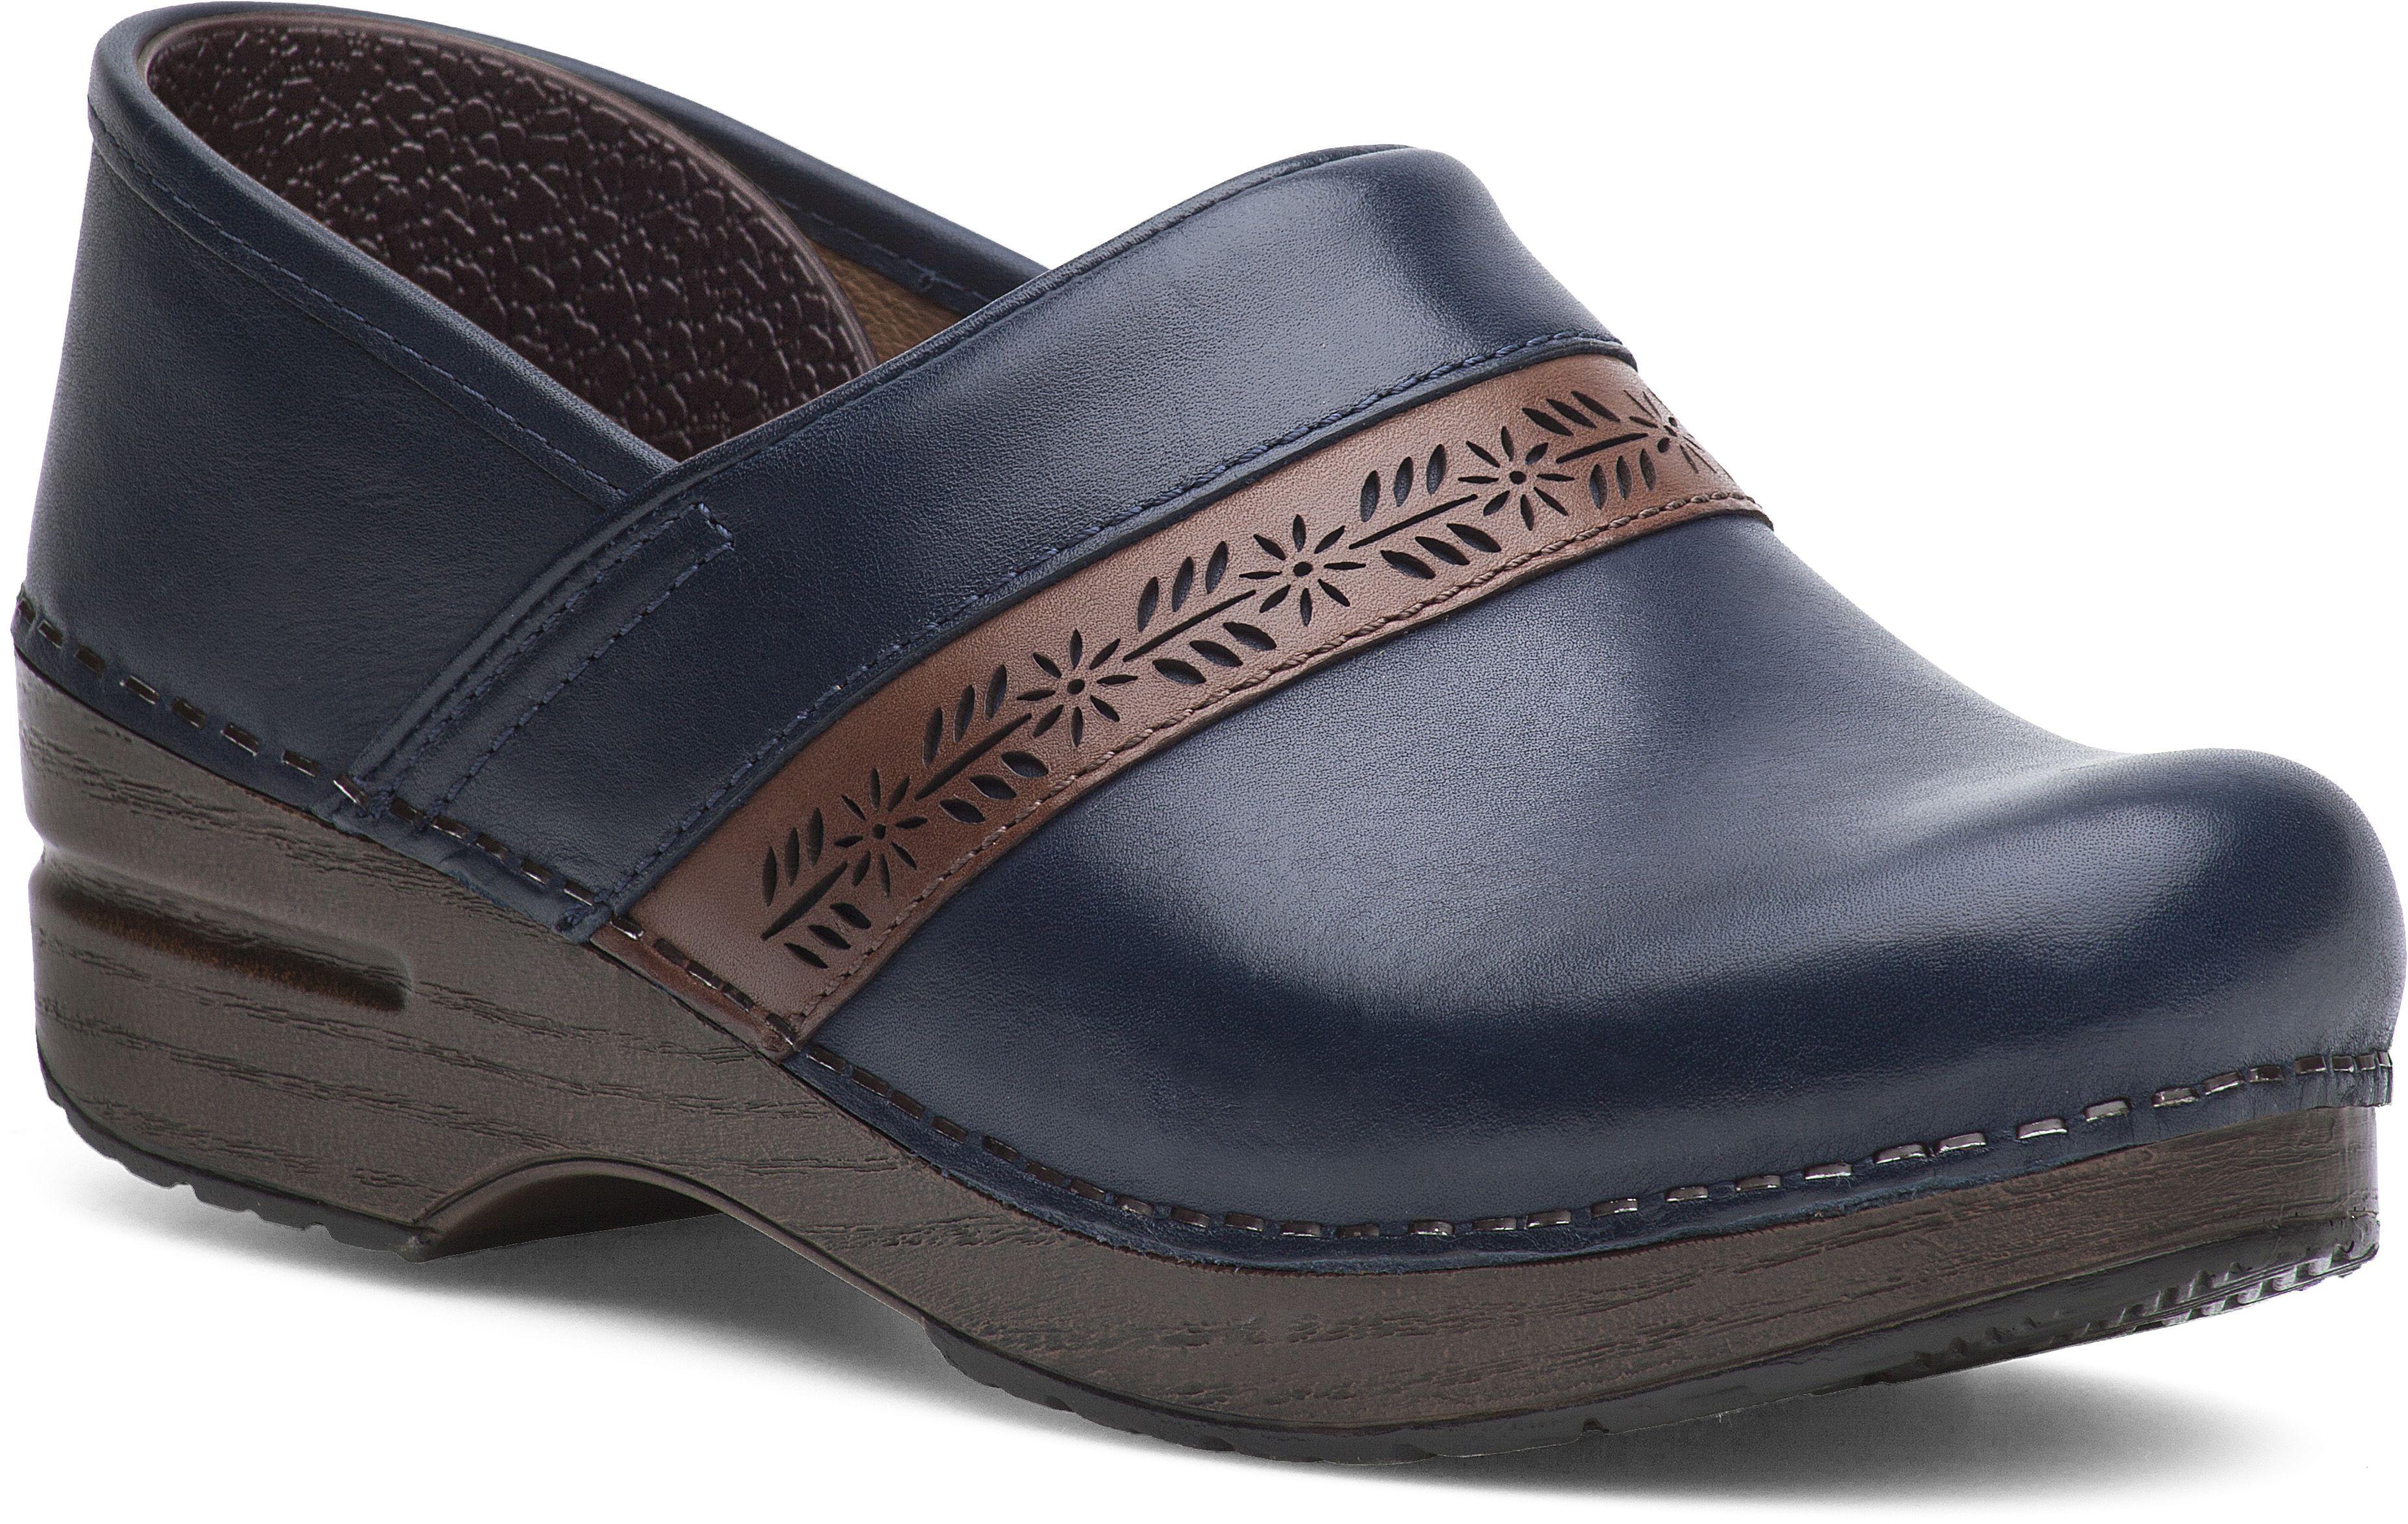 dansko | Women shoes, Clogs, Shoes